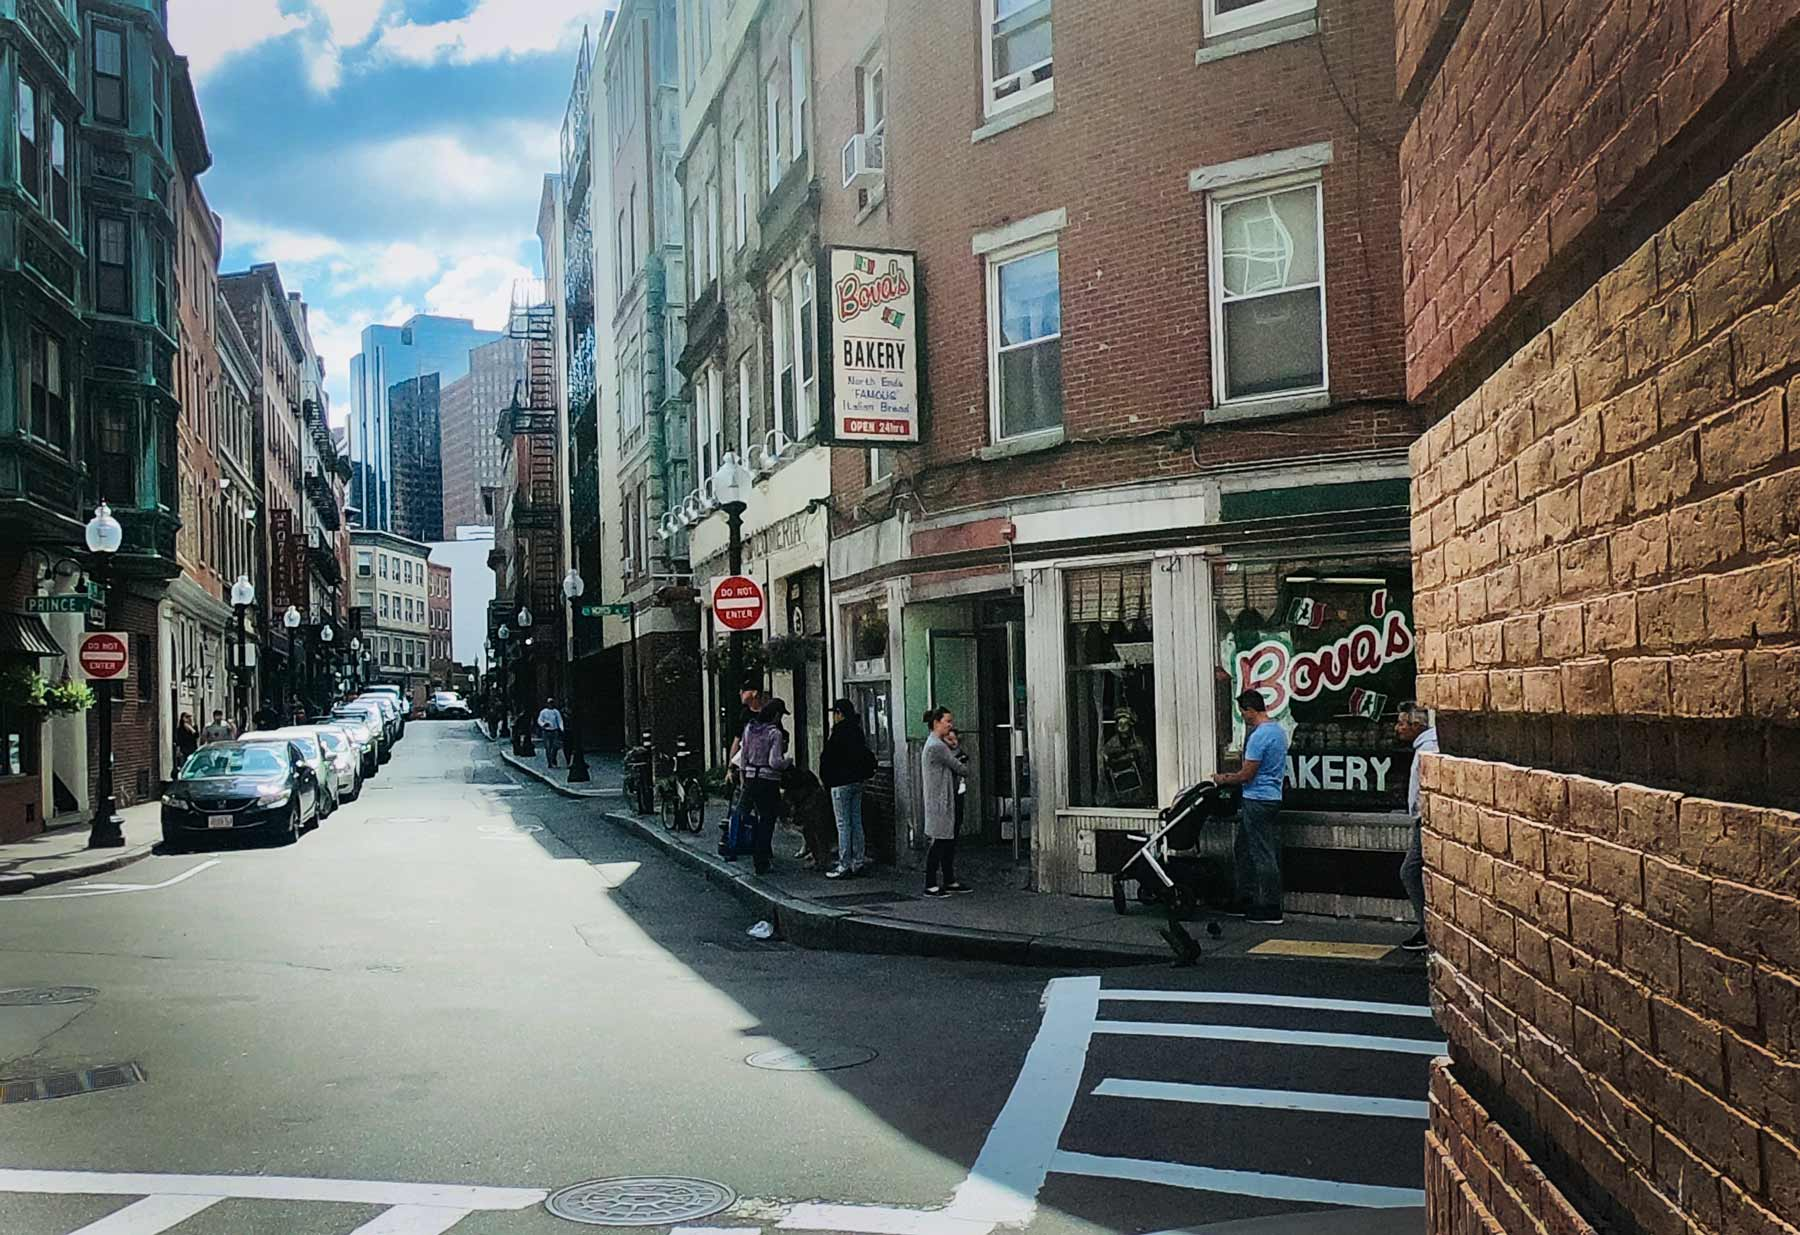 Exterior Italian Bova's Bakery in Boston, Massachusetts